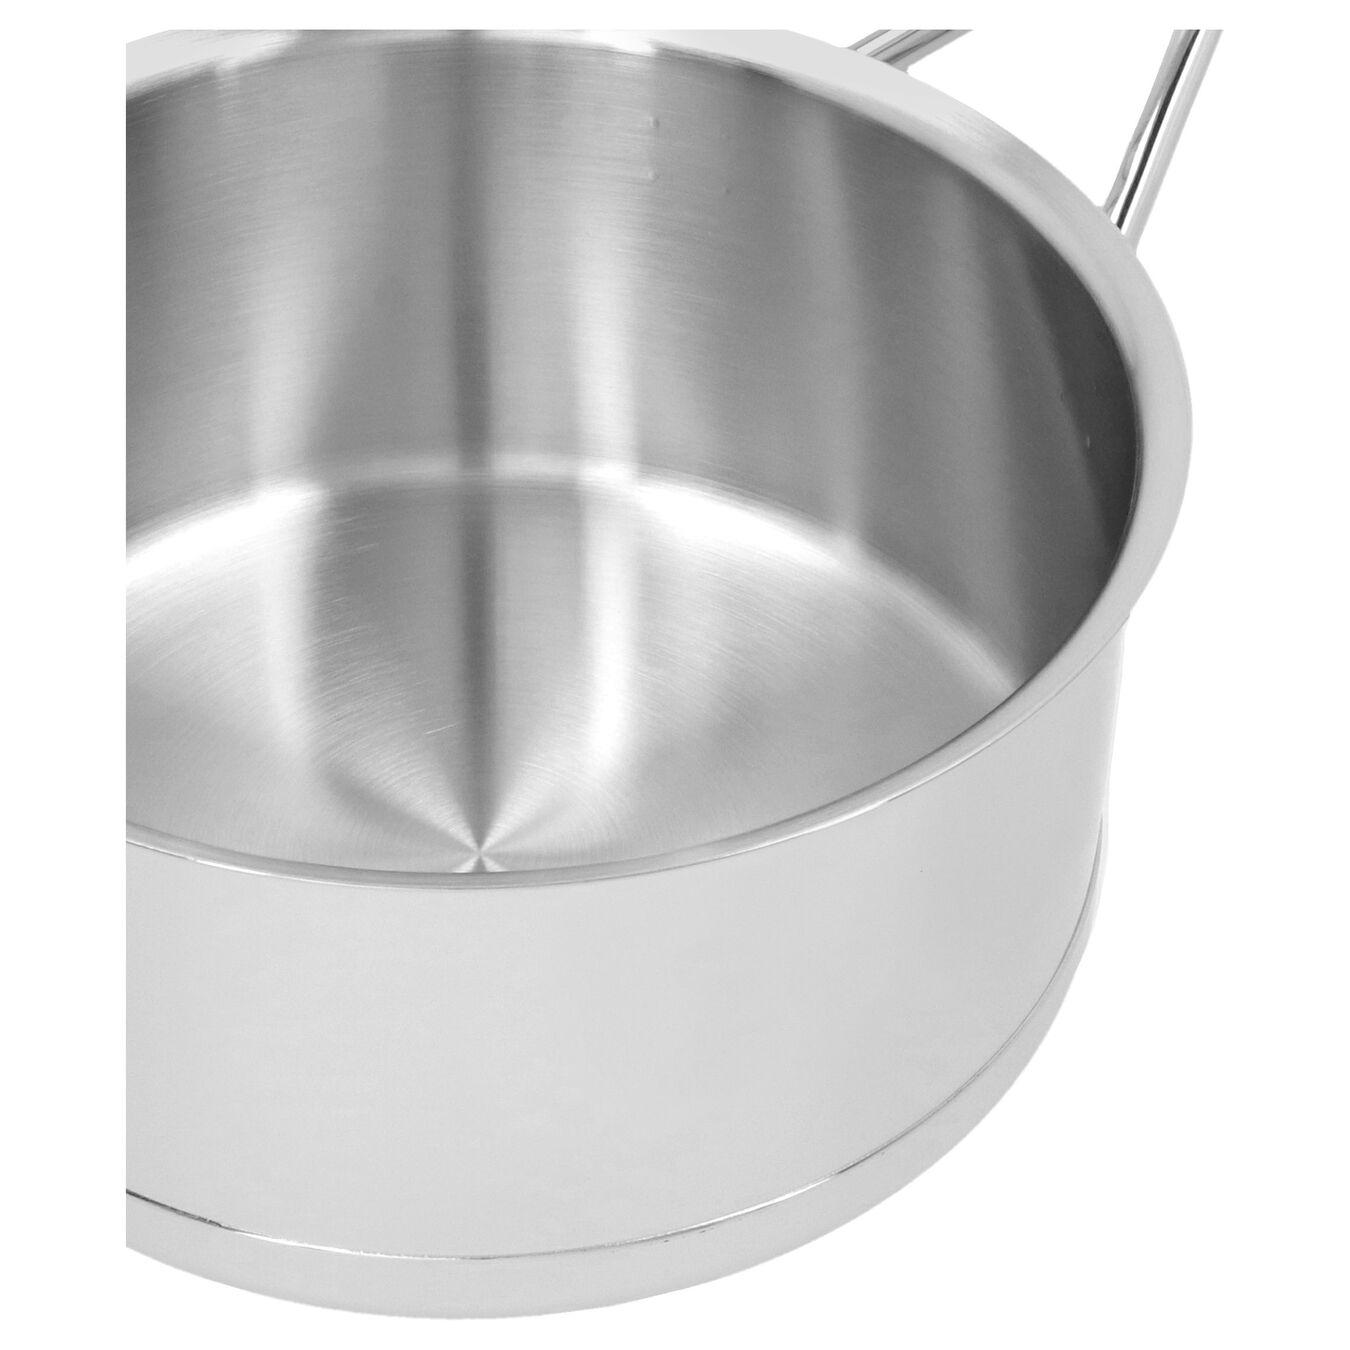 Steelpan zonder deksel 18 cm / 2.2 l,,large 3